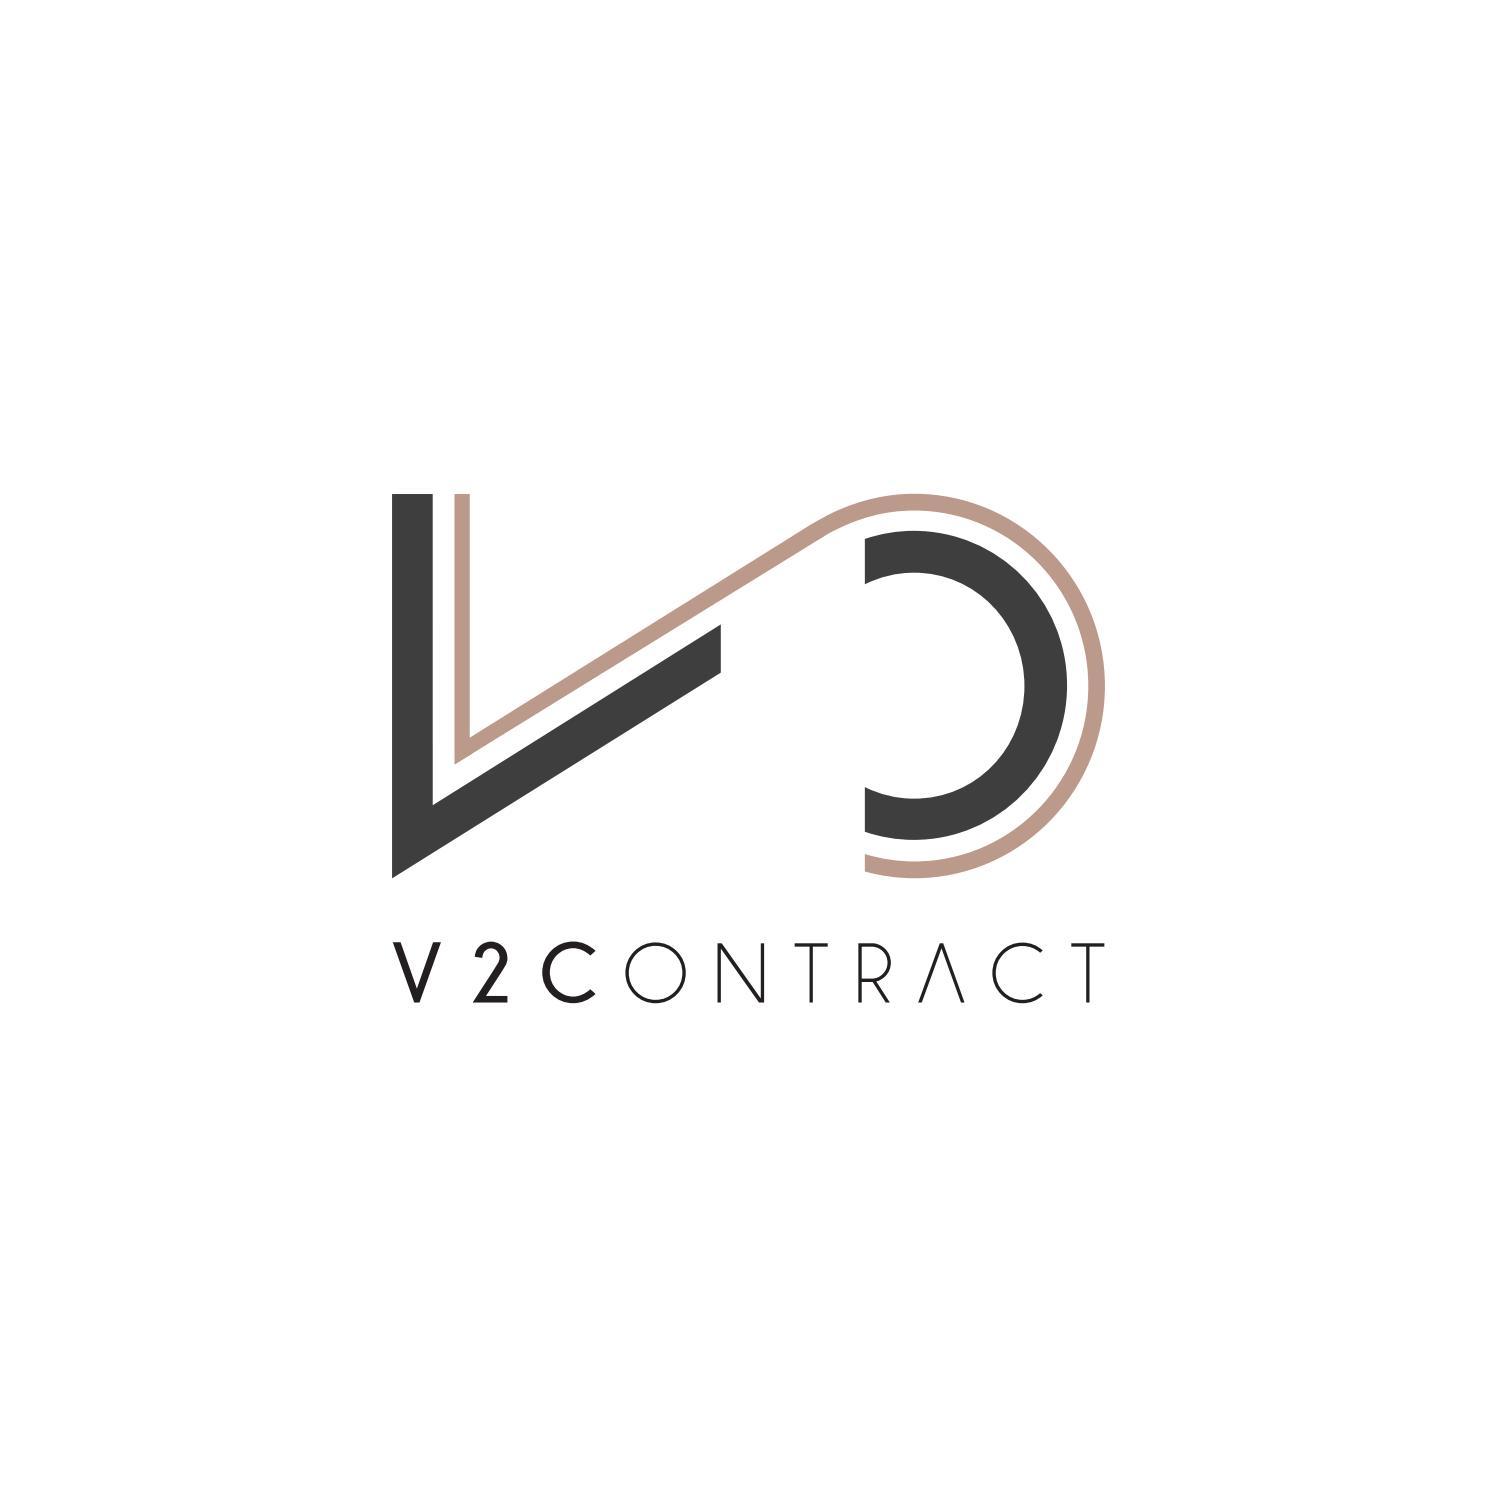 Manual de Identidad Corporativa V2C by